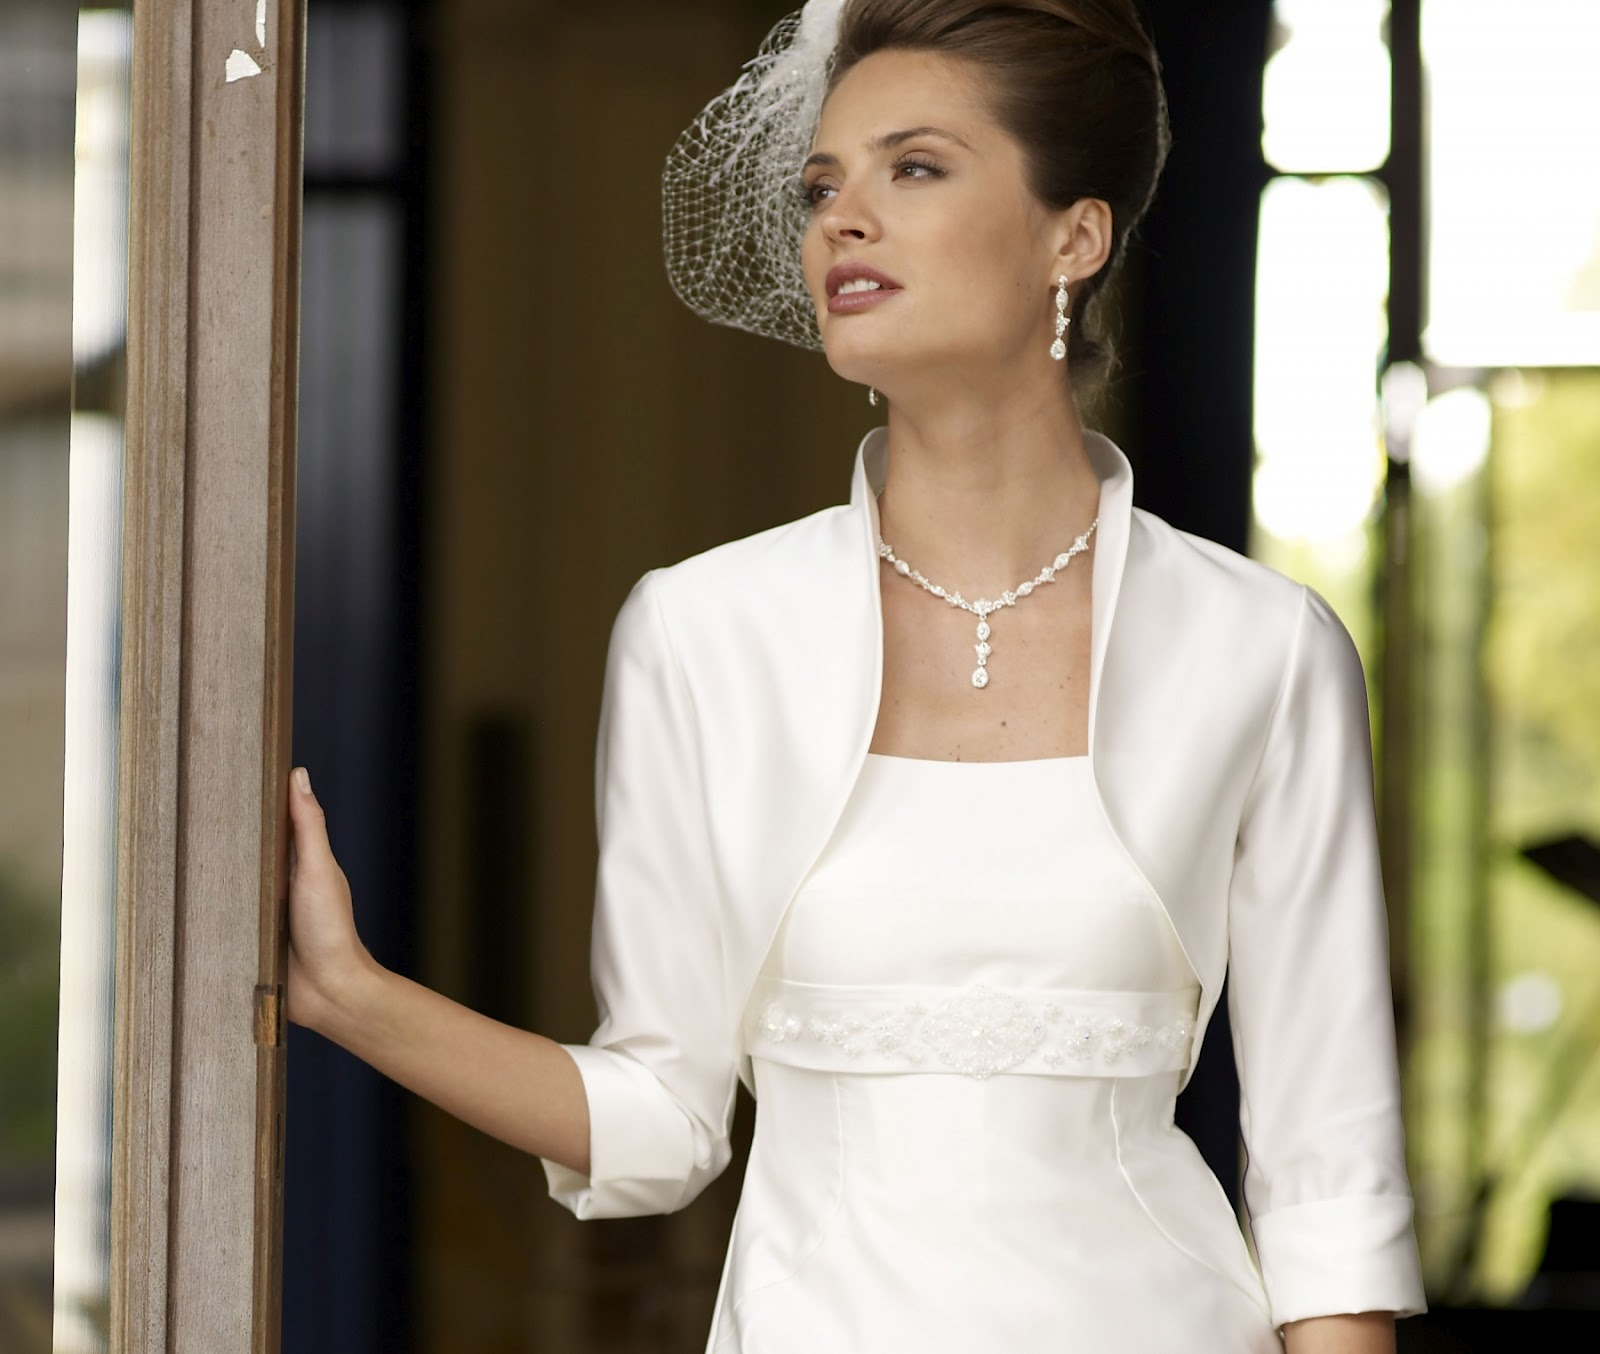 Atemberaubend Brautkleider Bolero Jacke Fotos - Brautkleider Ideen ...